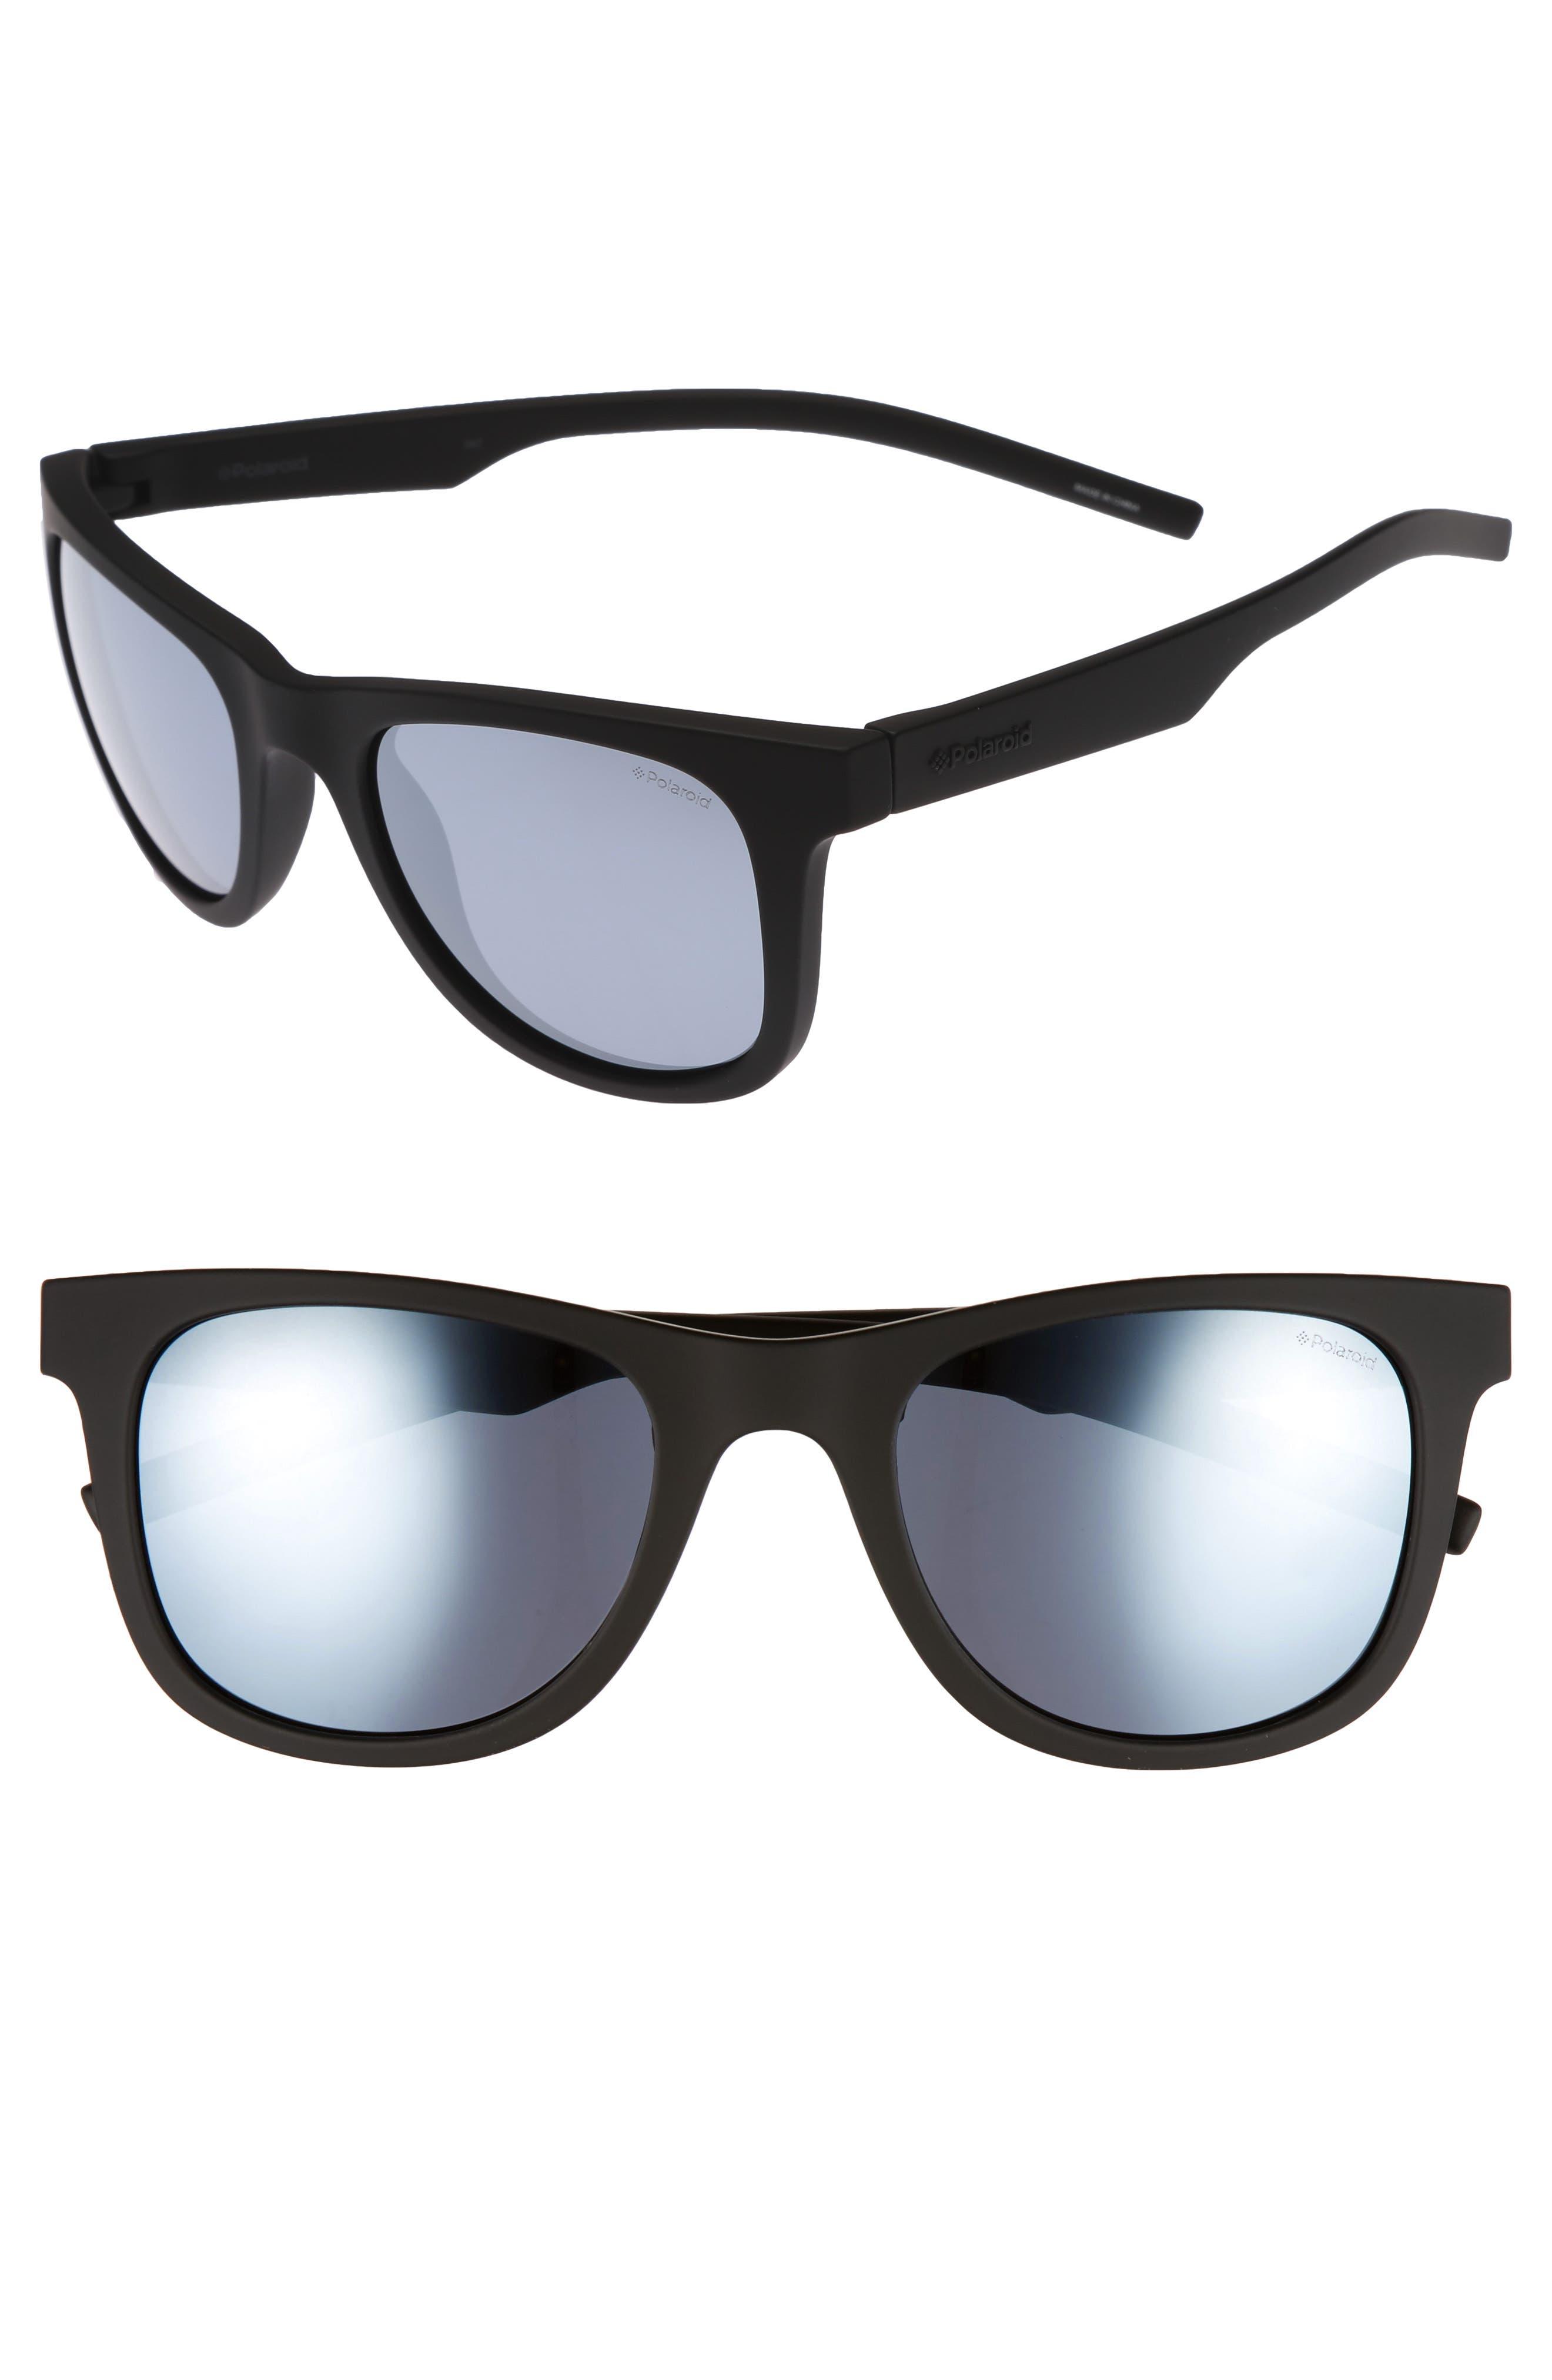 Main Image - Polaroid 7020S 52mm Polarized Sunglasses